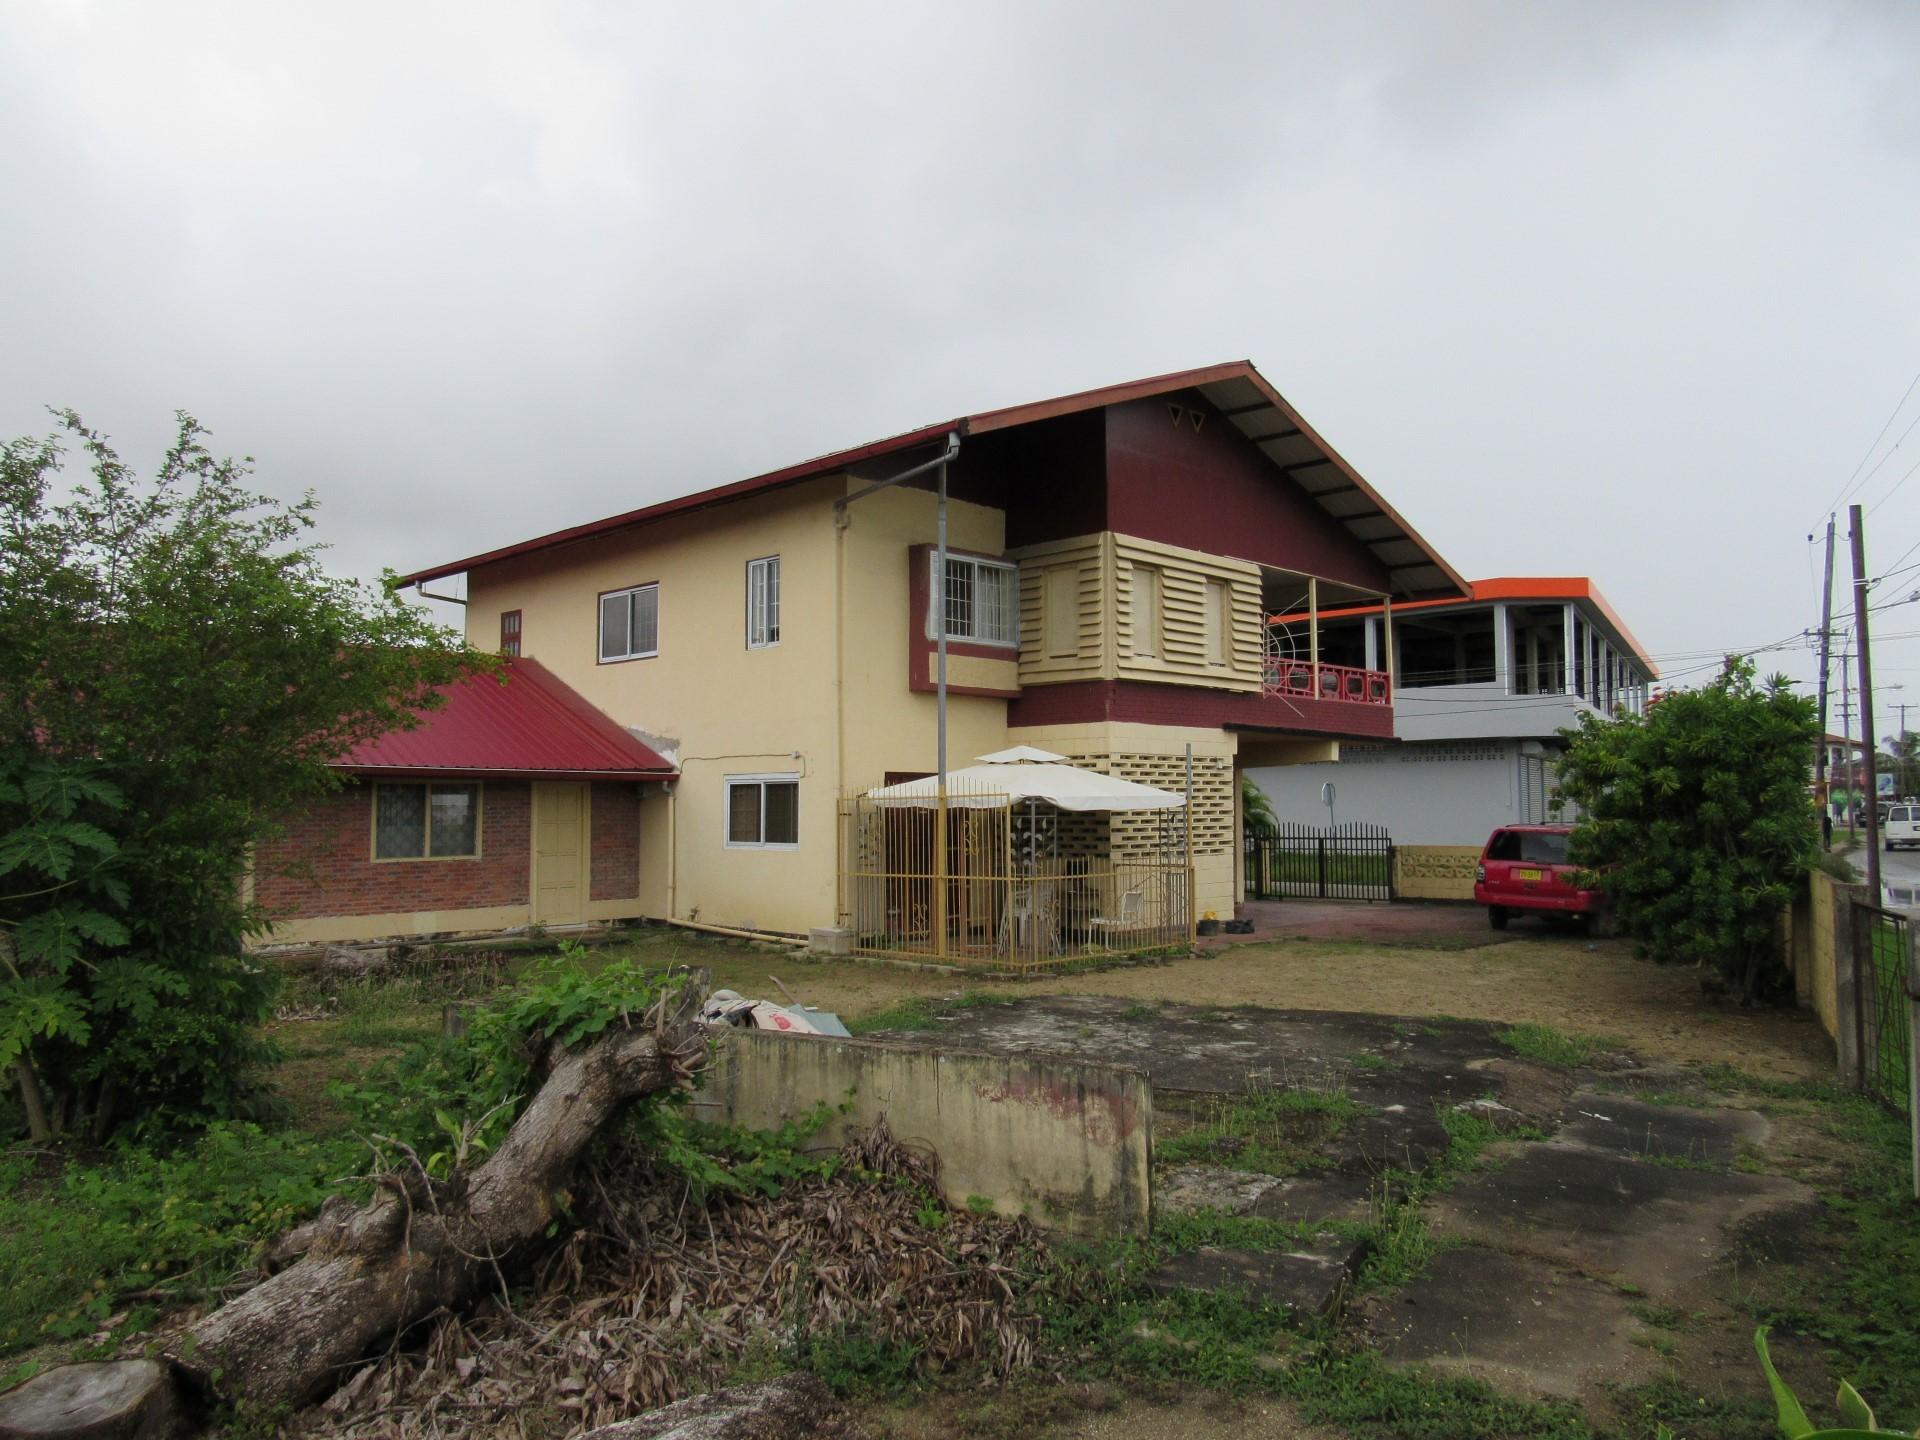 Henkielaan-32-Koopwoning-Terzol-Vastgoed-Paramaribo-Suriname-28